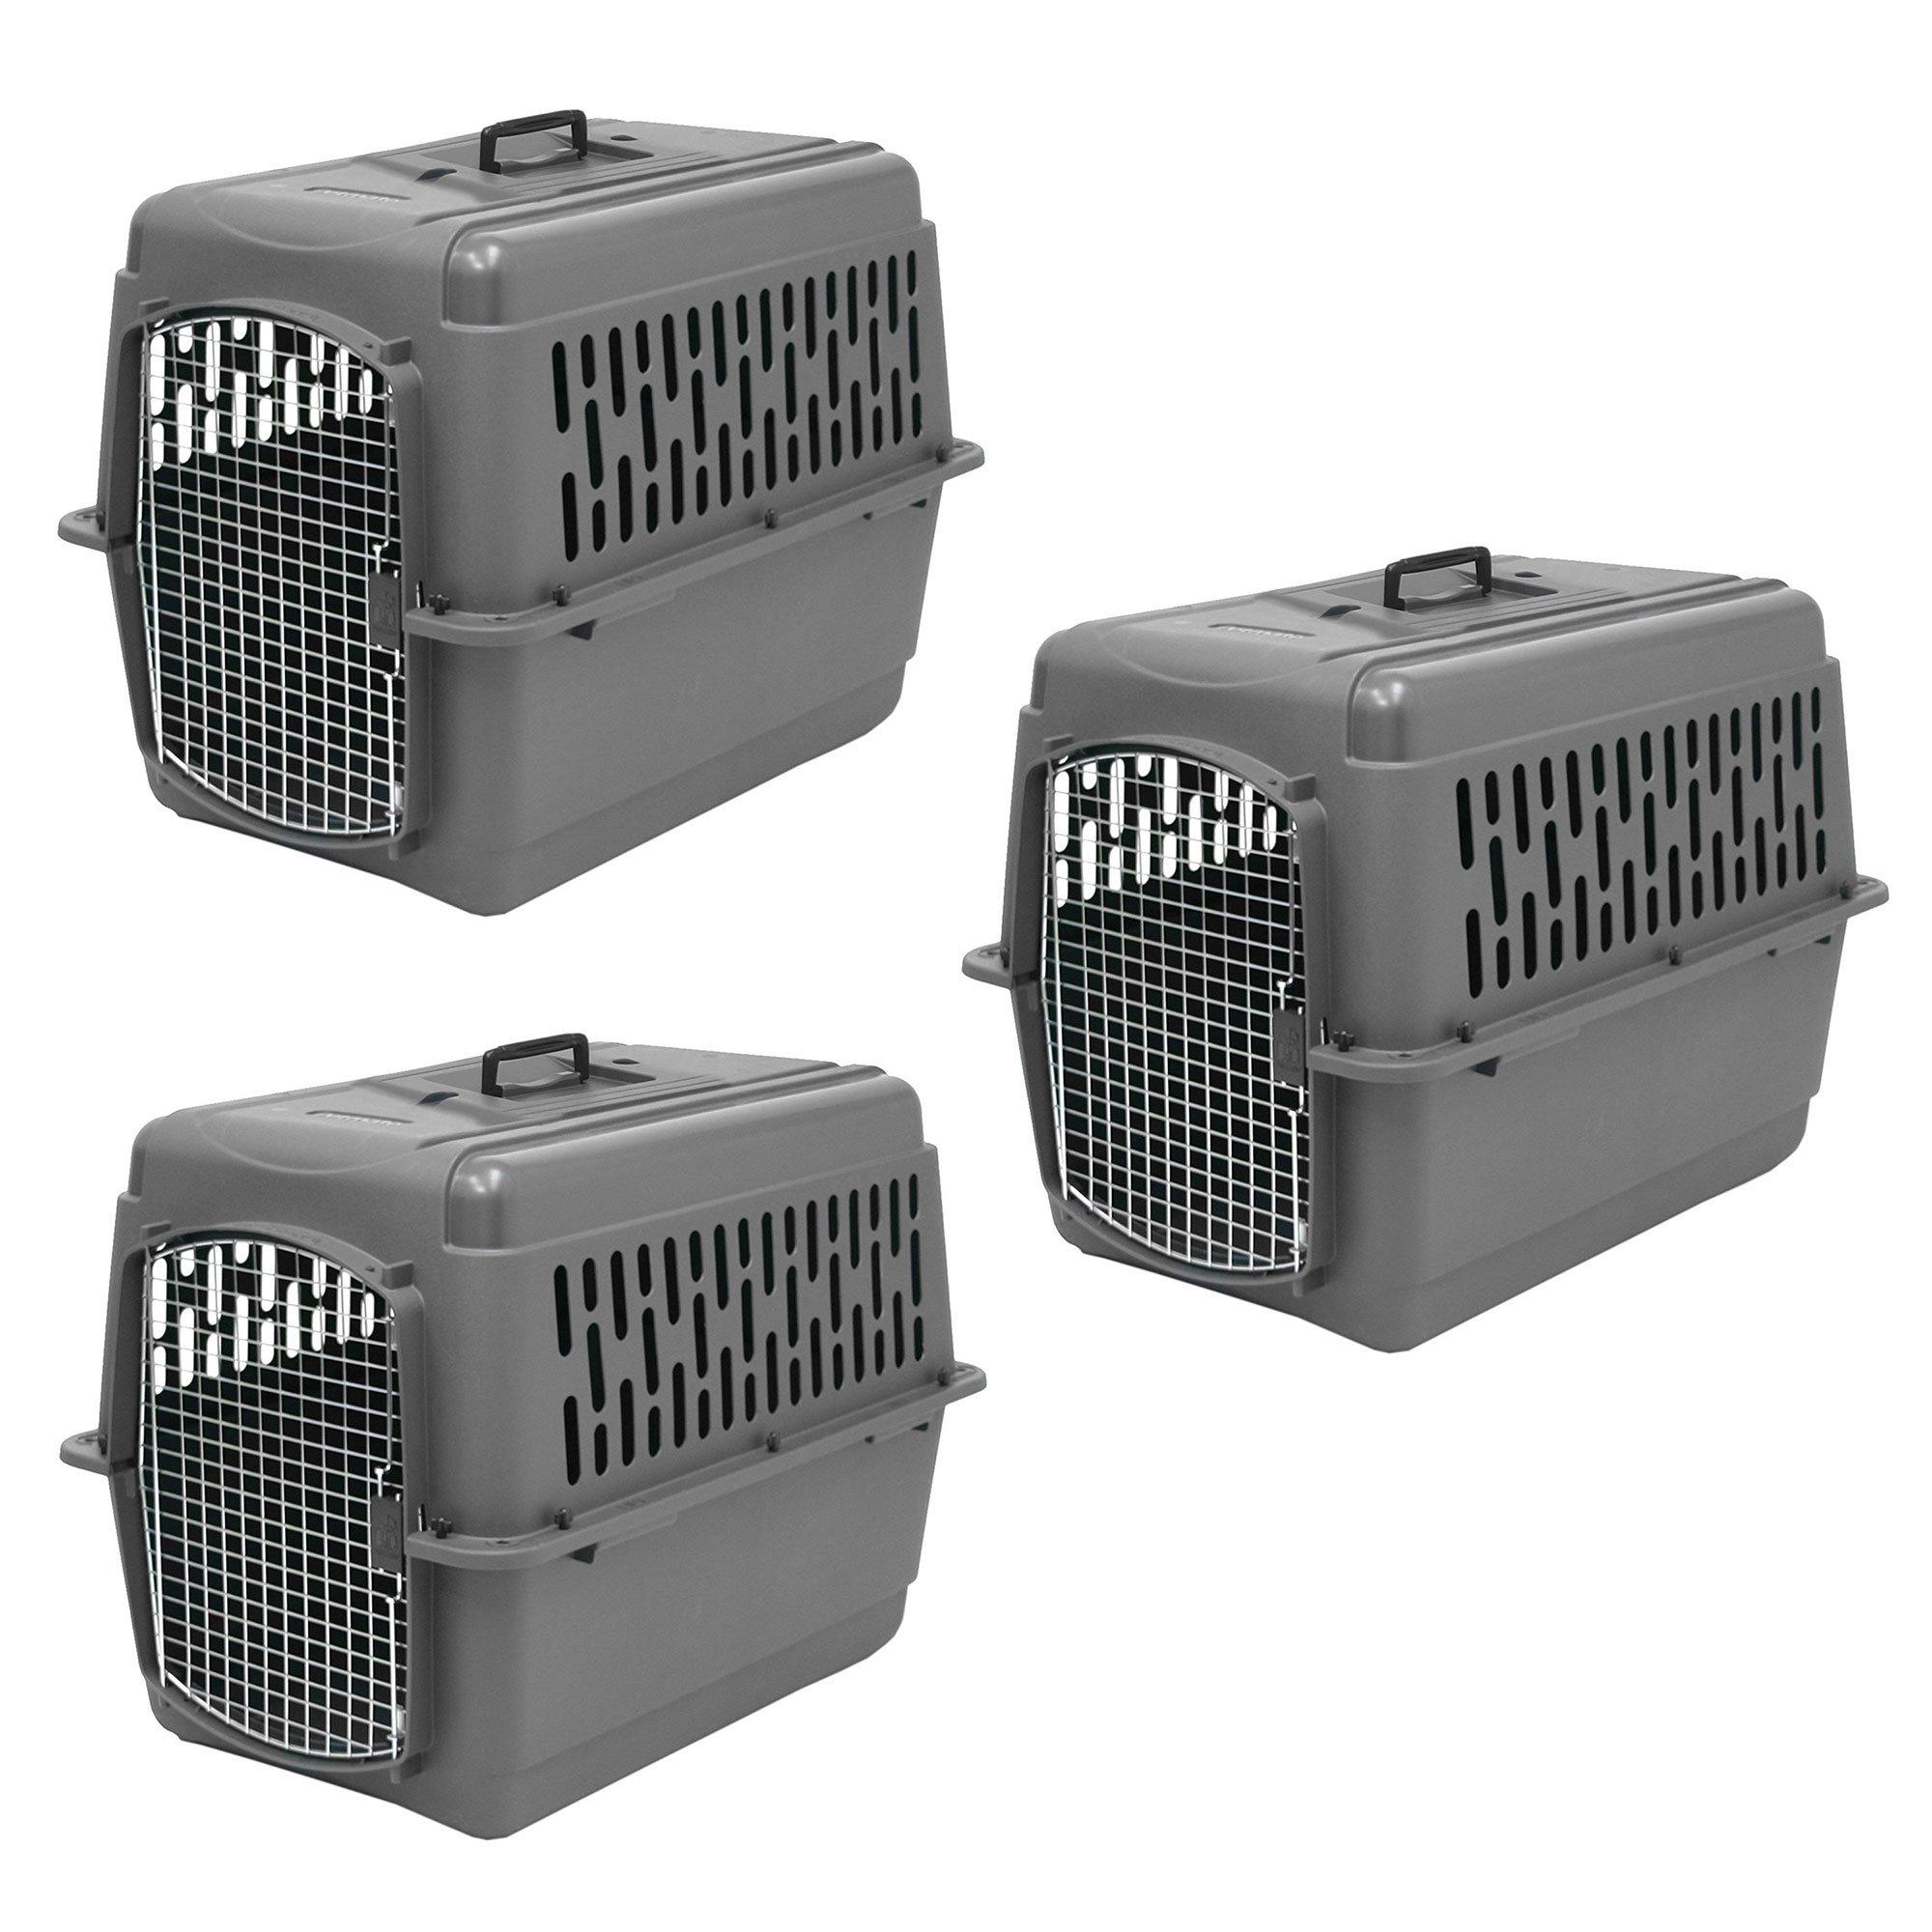 Aspen Pet Porter Plastic 28 Inch 25-30 Pound Pet Travel Carrier Kennel (3  Pack) 23fadc39b